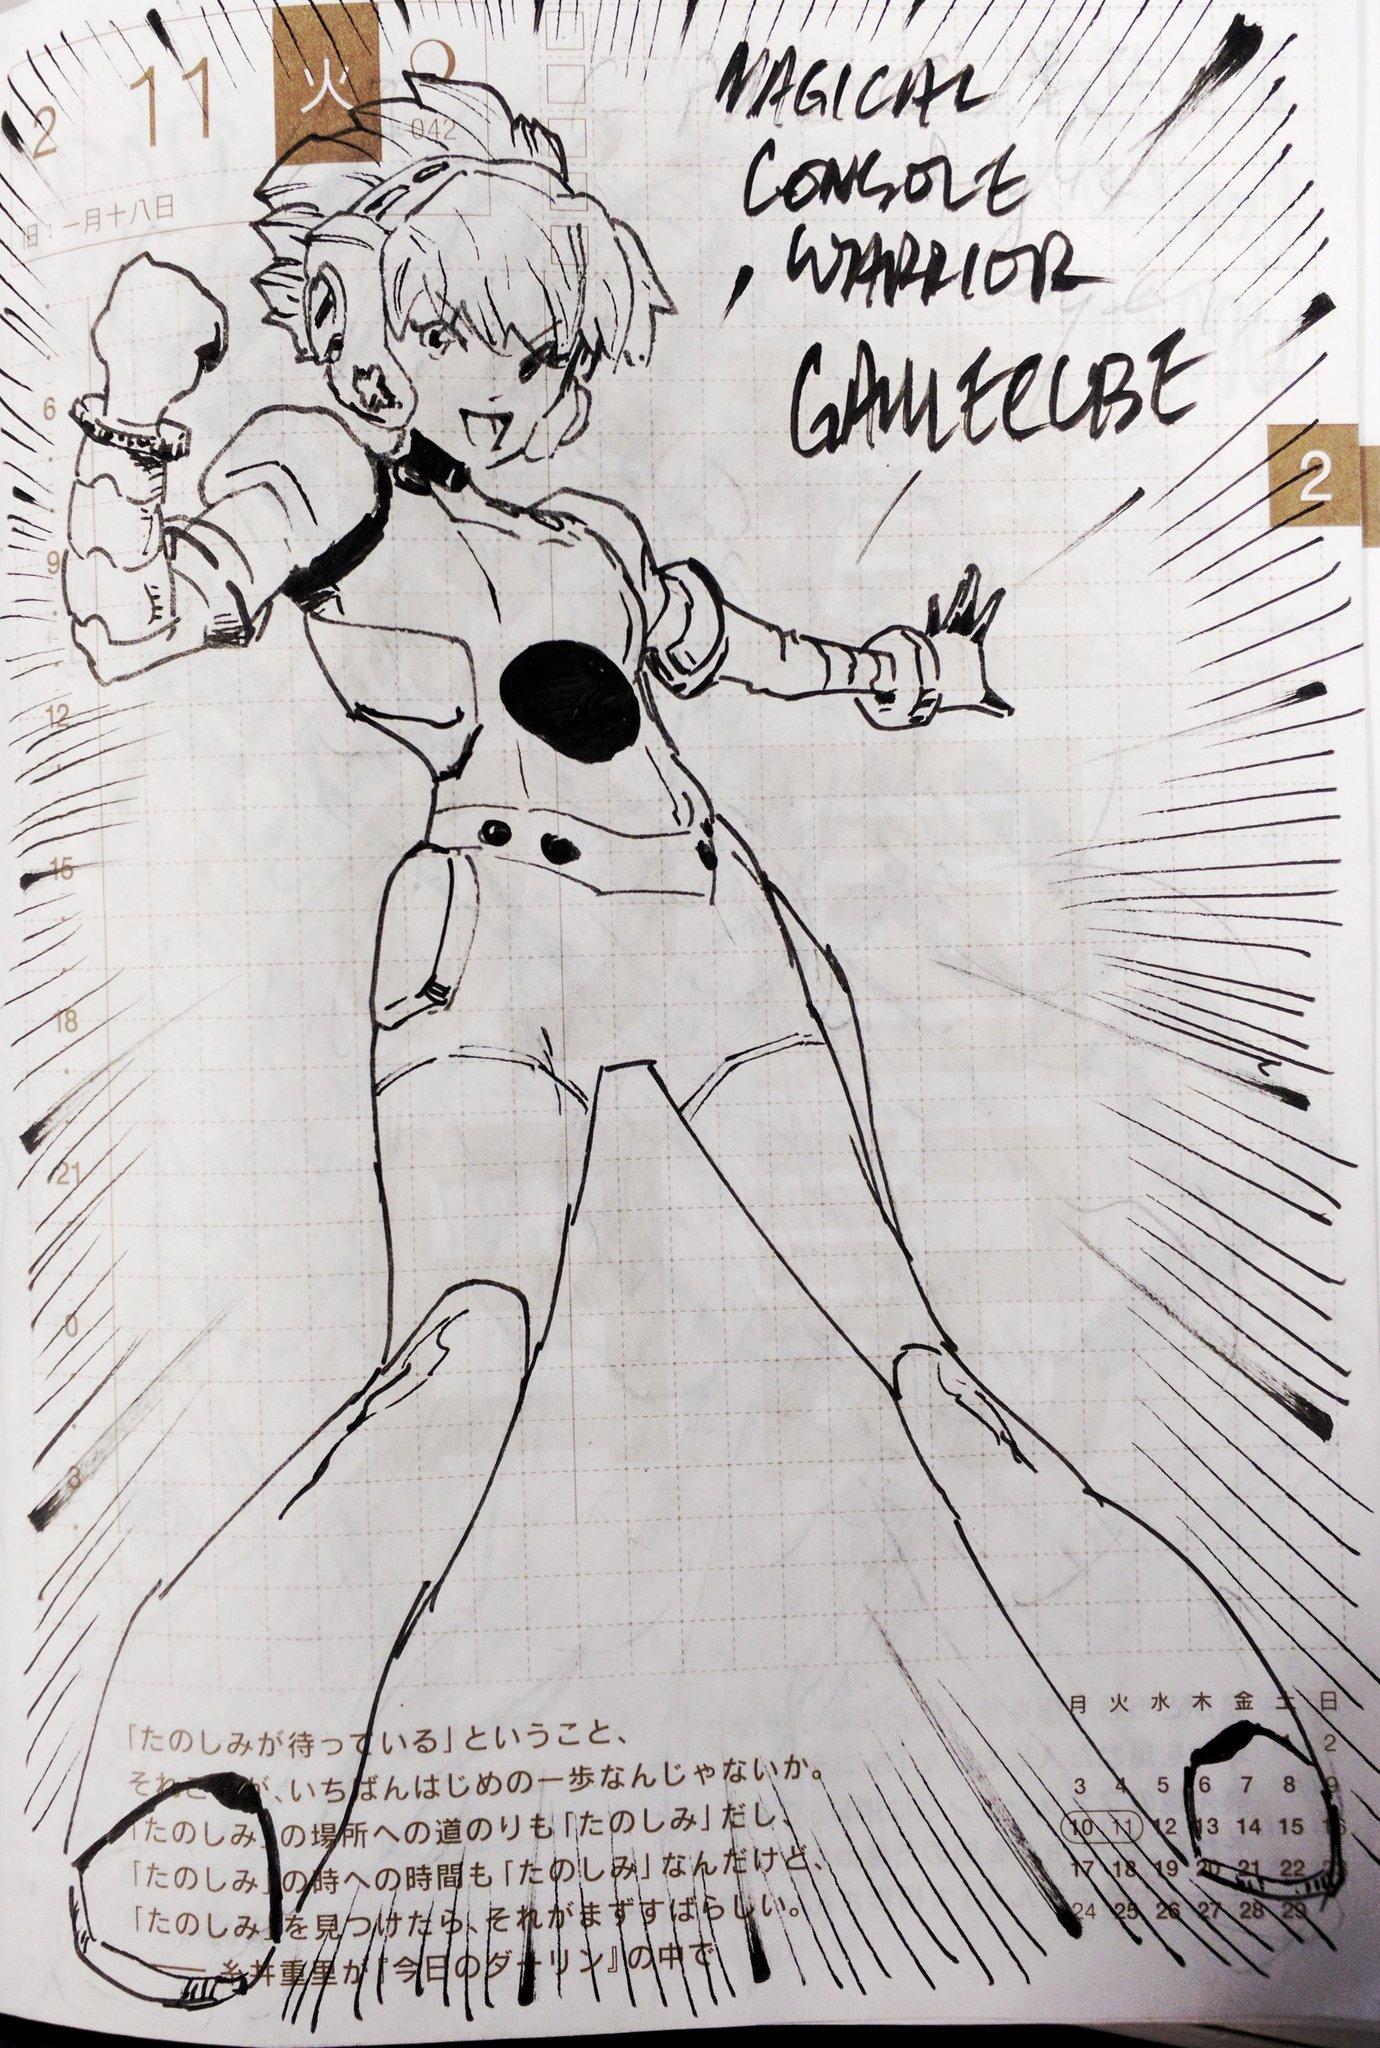 Magical Console Warrior GAMECUBE